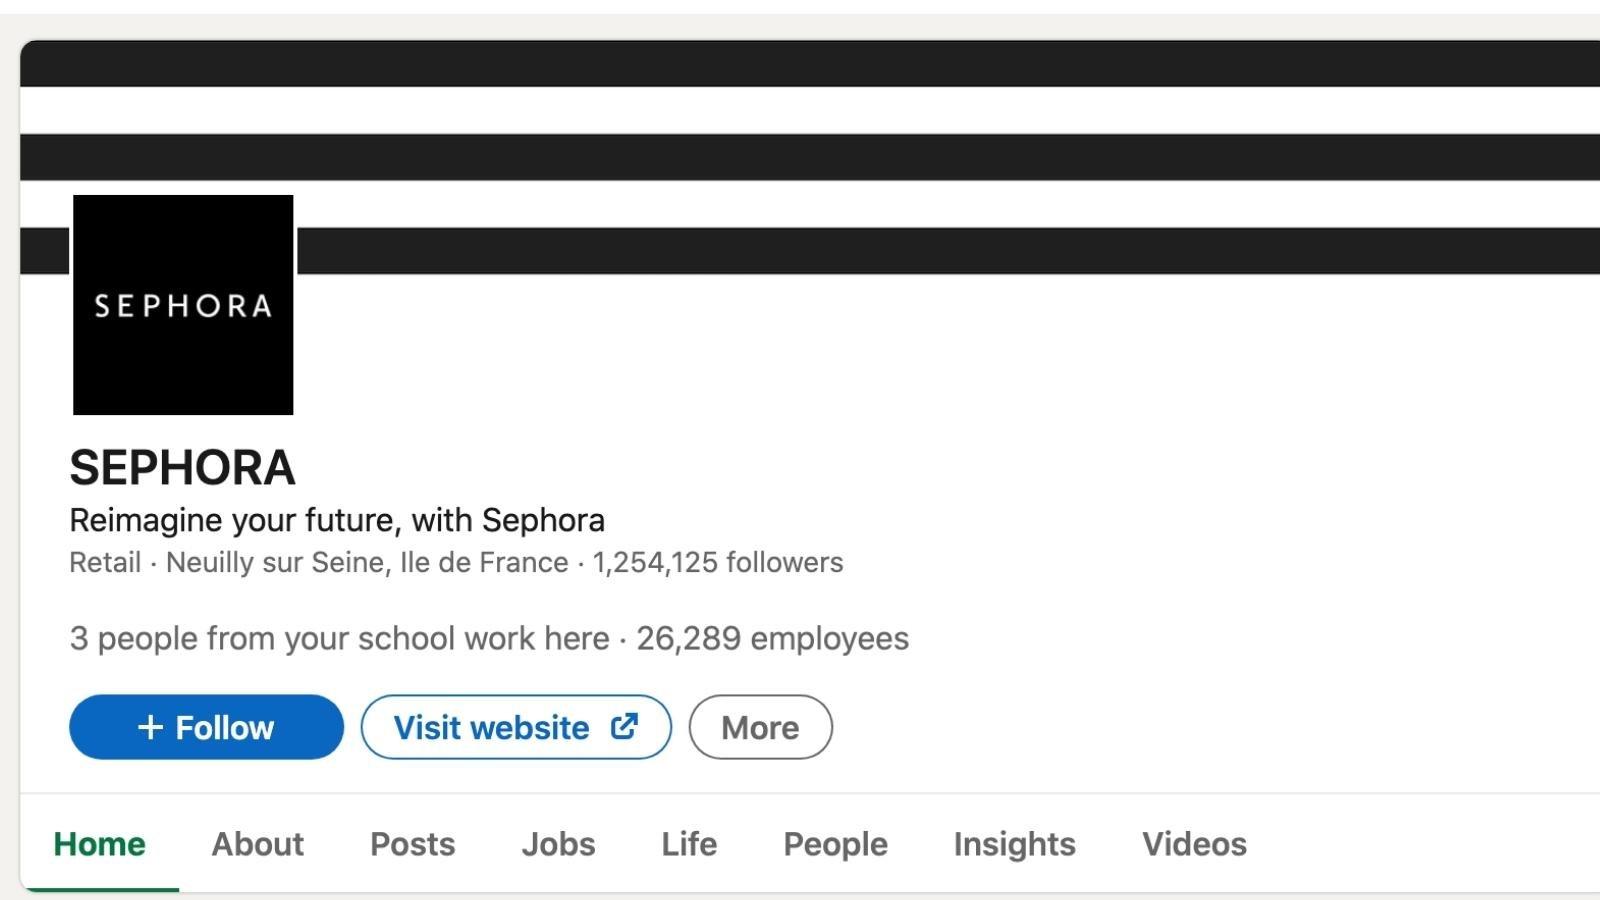 social media brand building with Sephora on LinkedIn